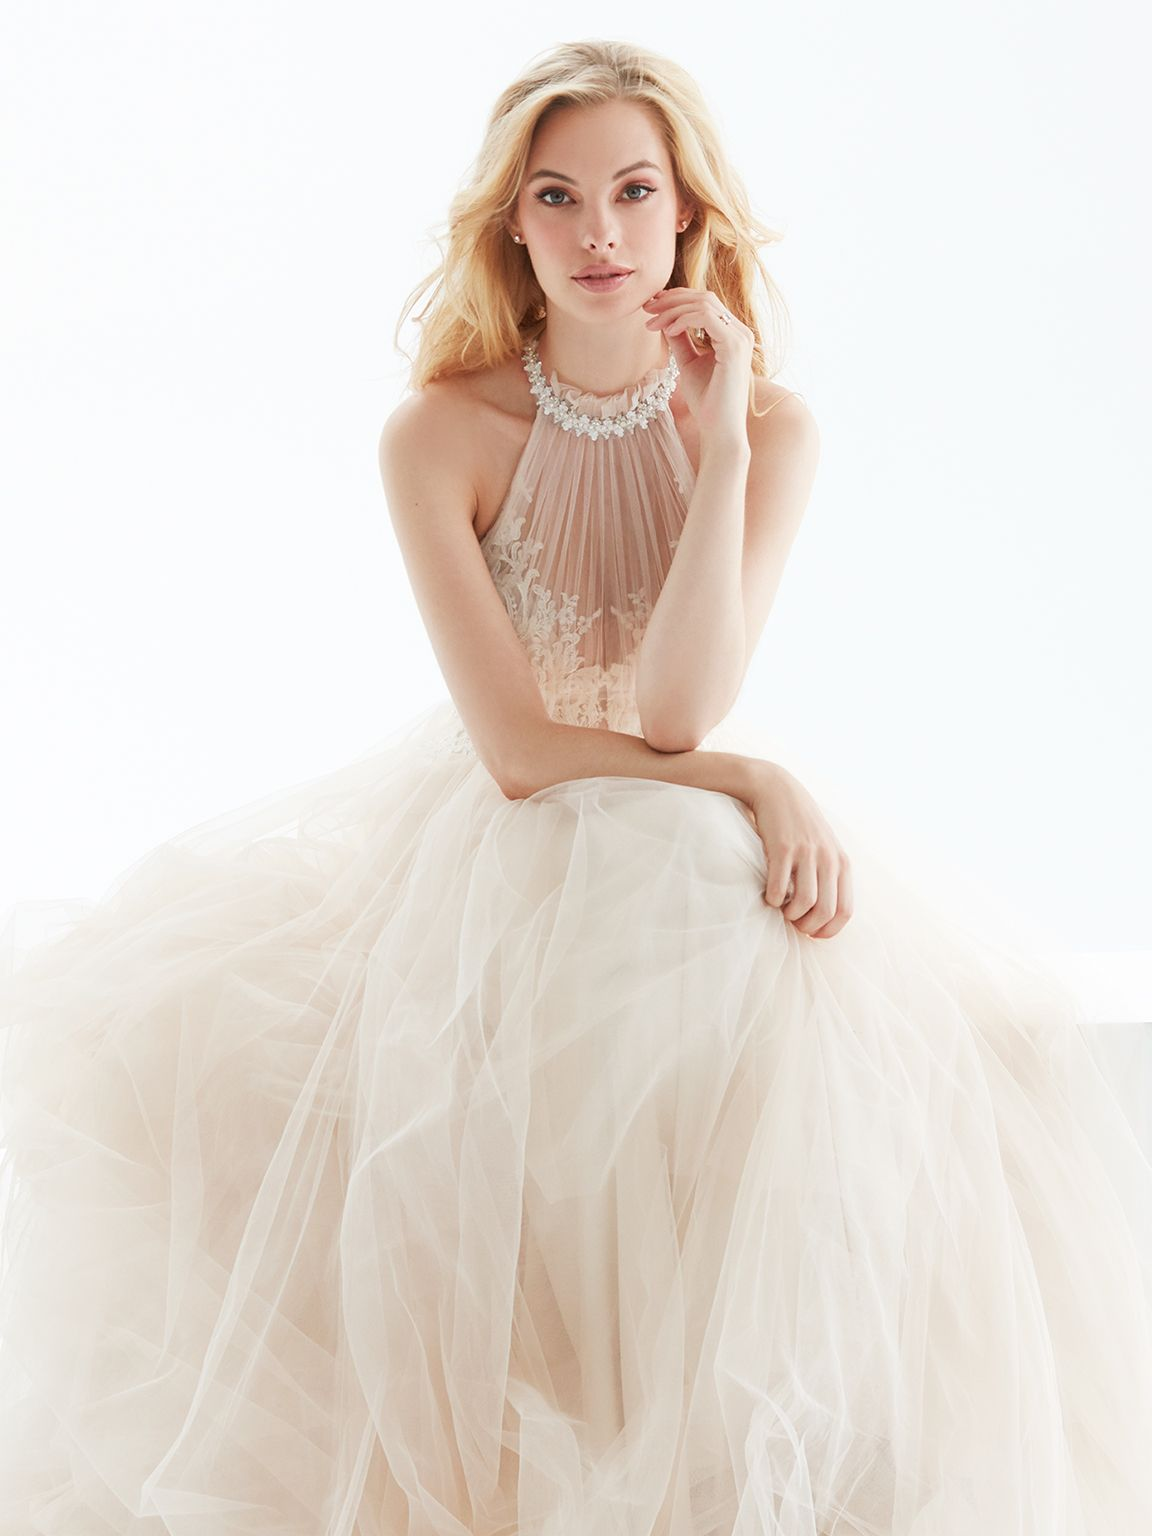 Allure Madison James MJ403 --- New York Bride & Groom {Charlotte ...